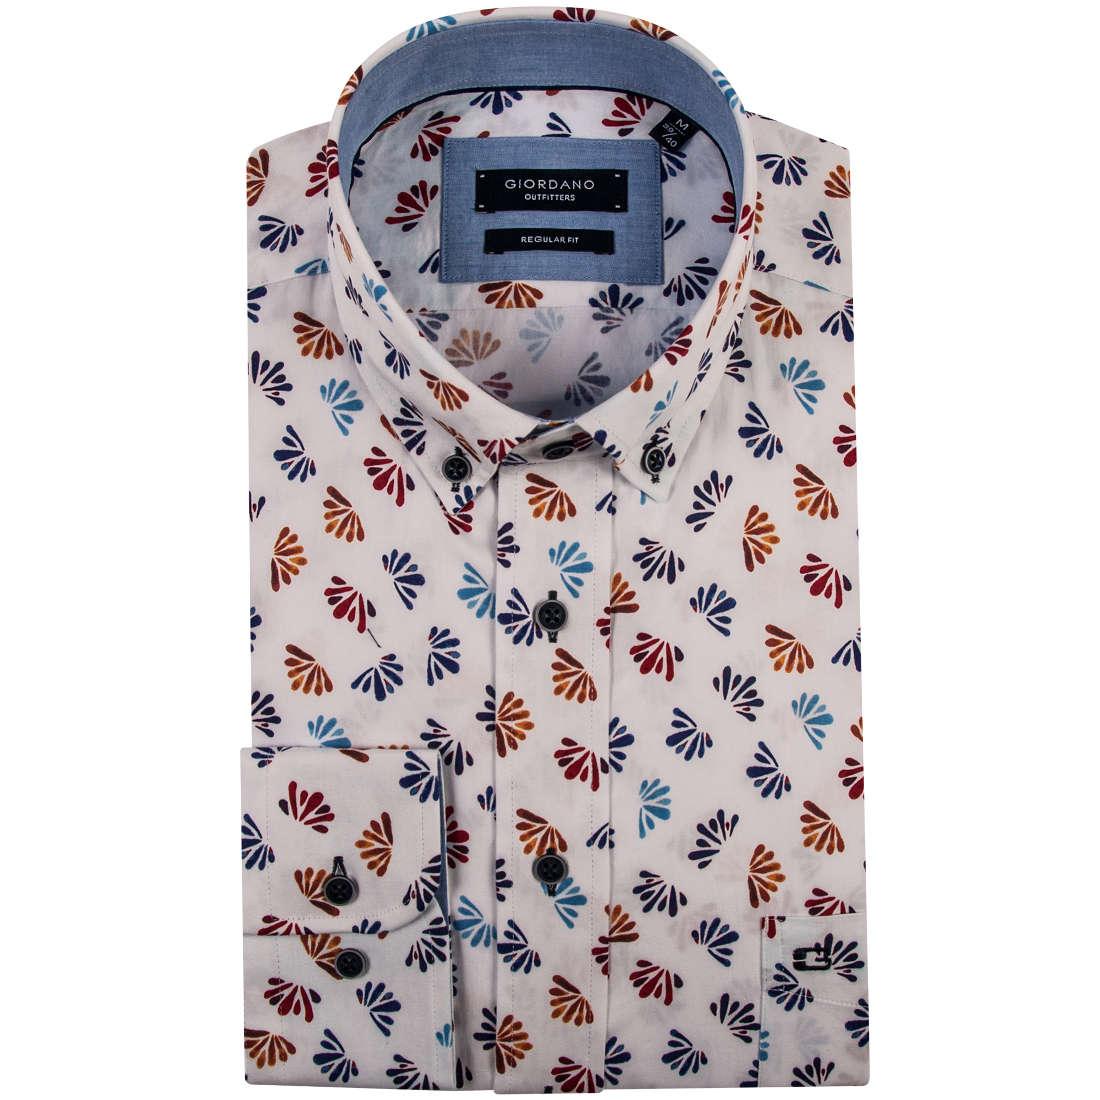 Giordano overhemd Regular Fit 91-6024 in het Wit